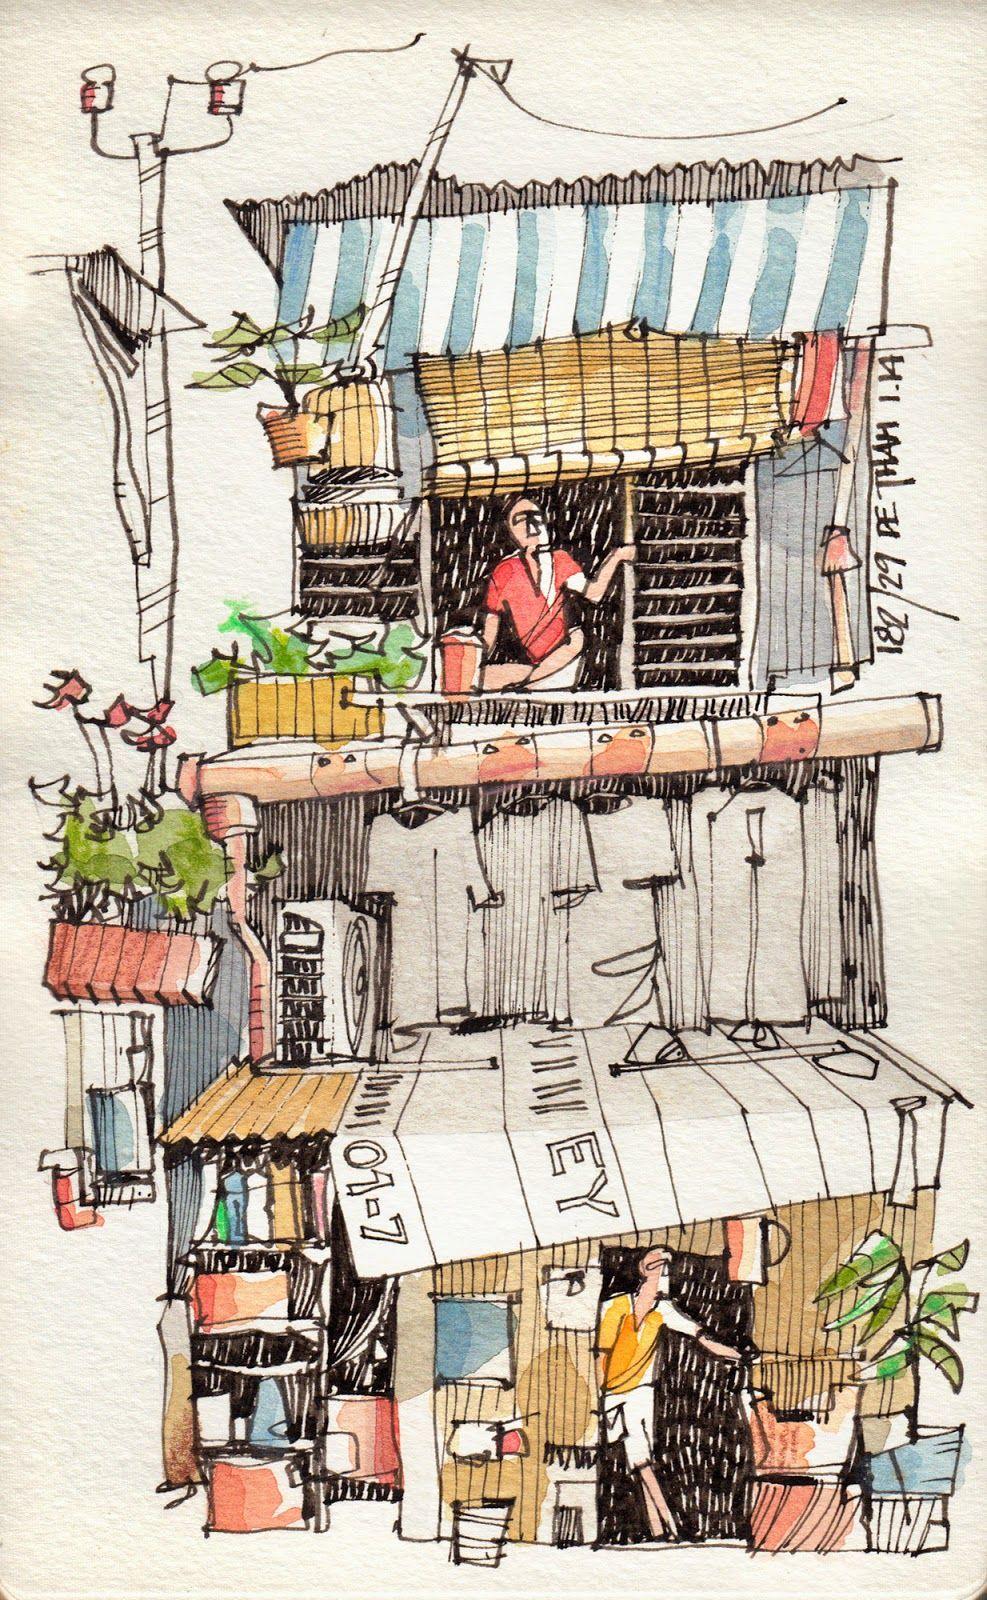 Vietnam January 2014 4 アーバンスケッチ 水彩色鉛筆 イラスト スケッチ